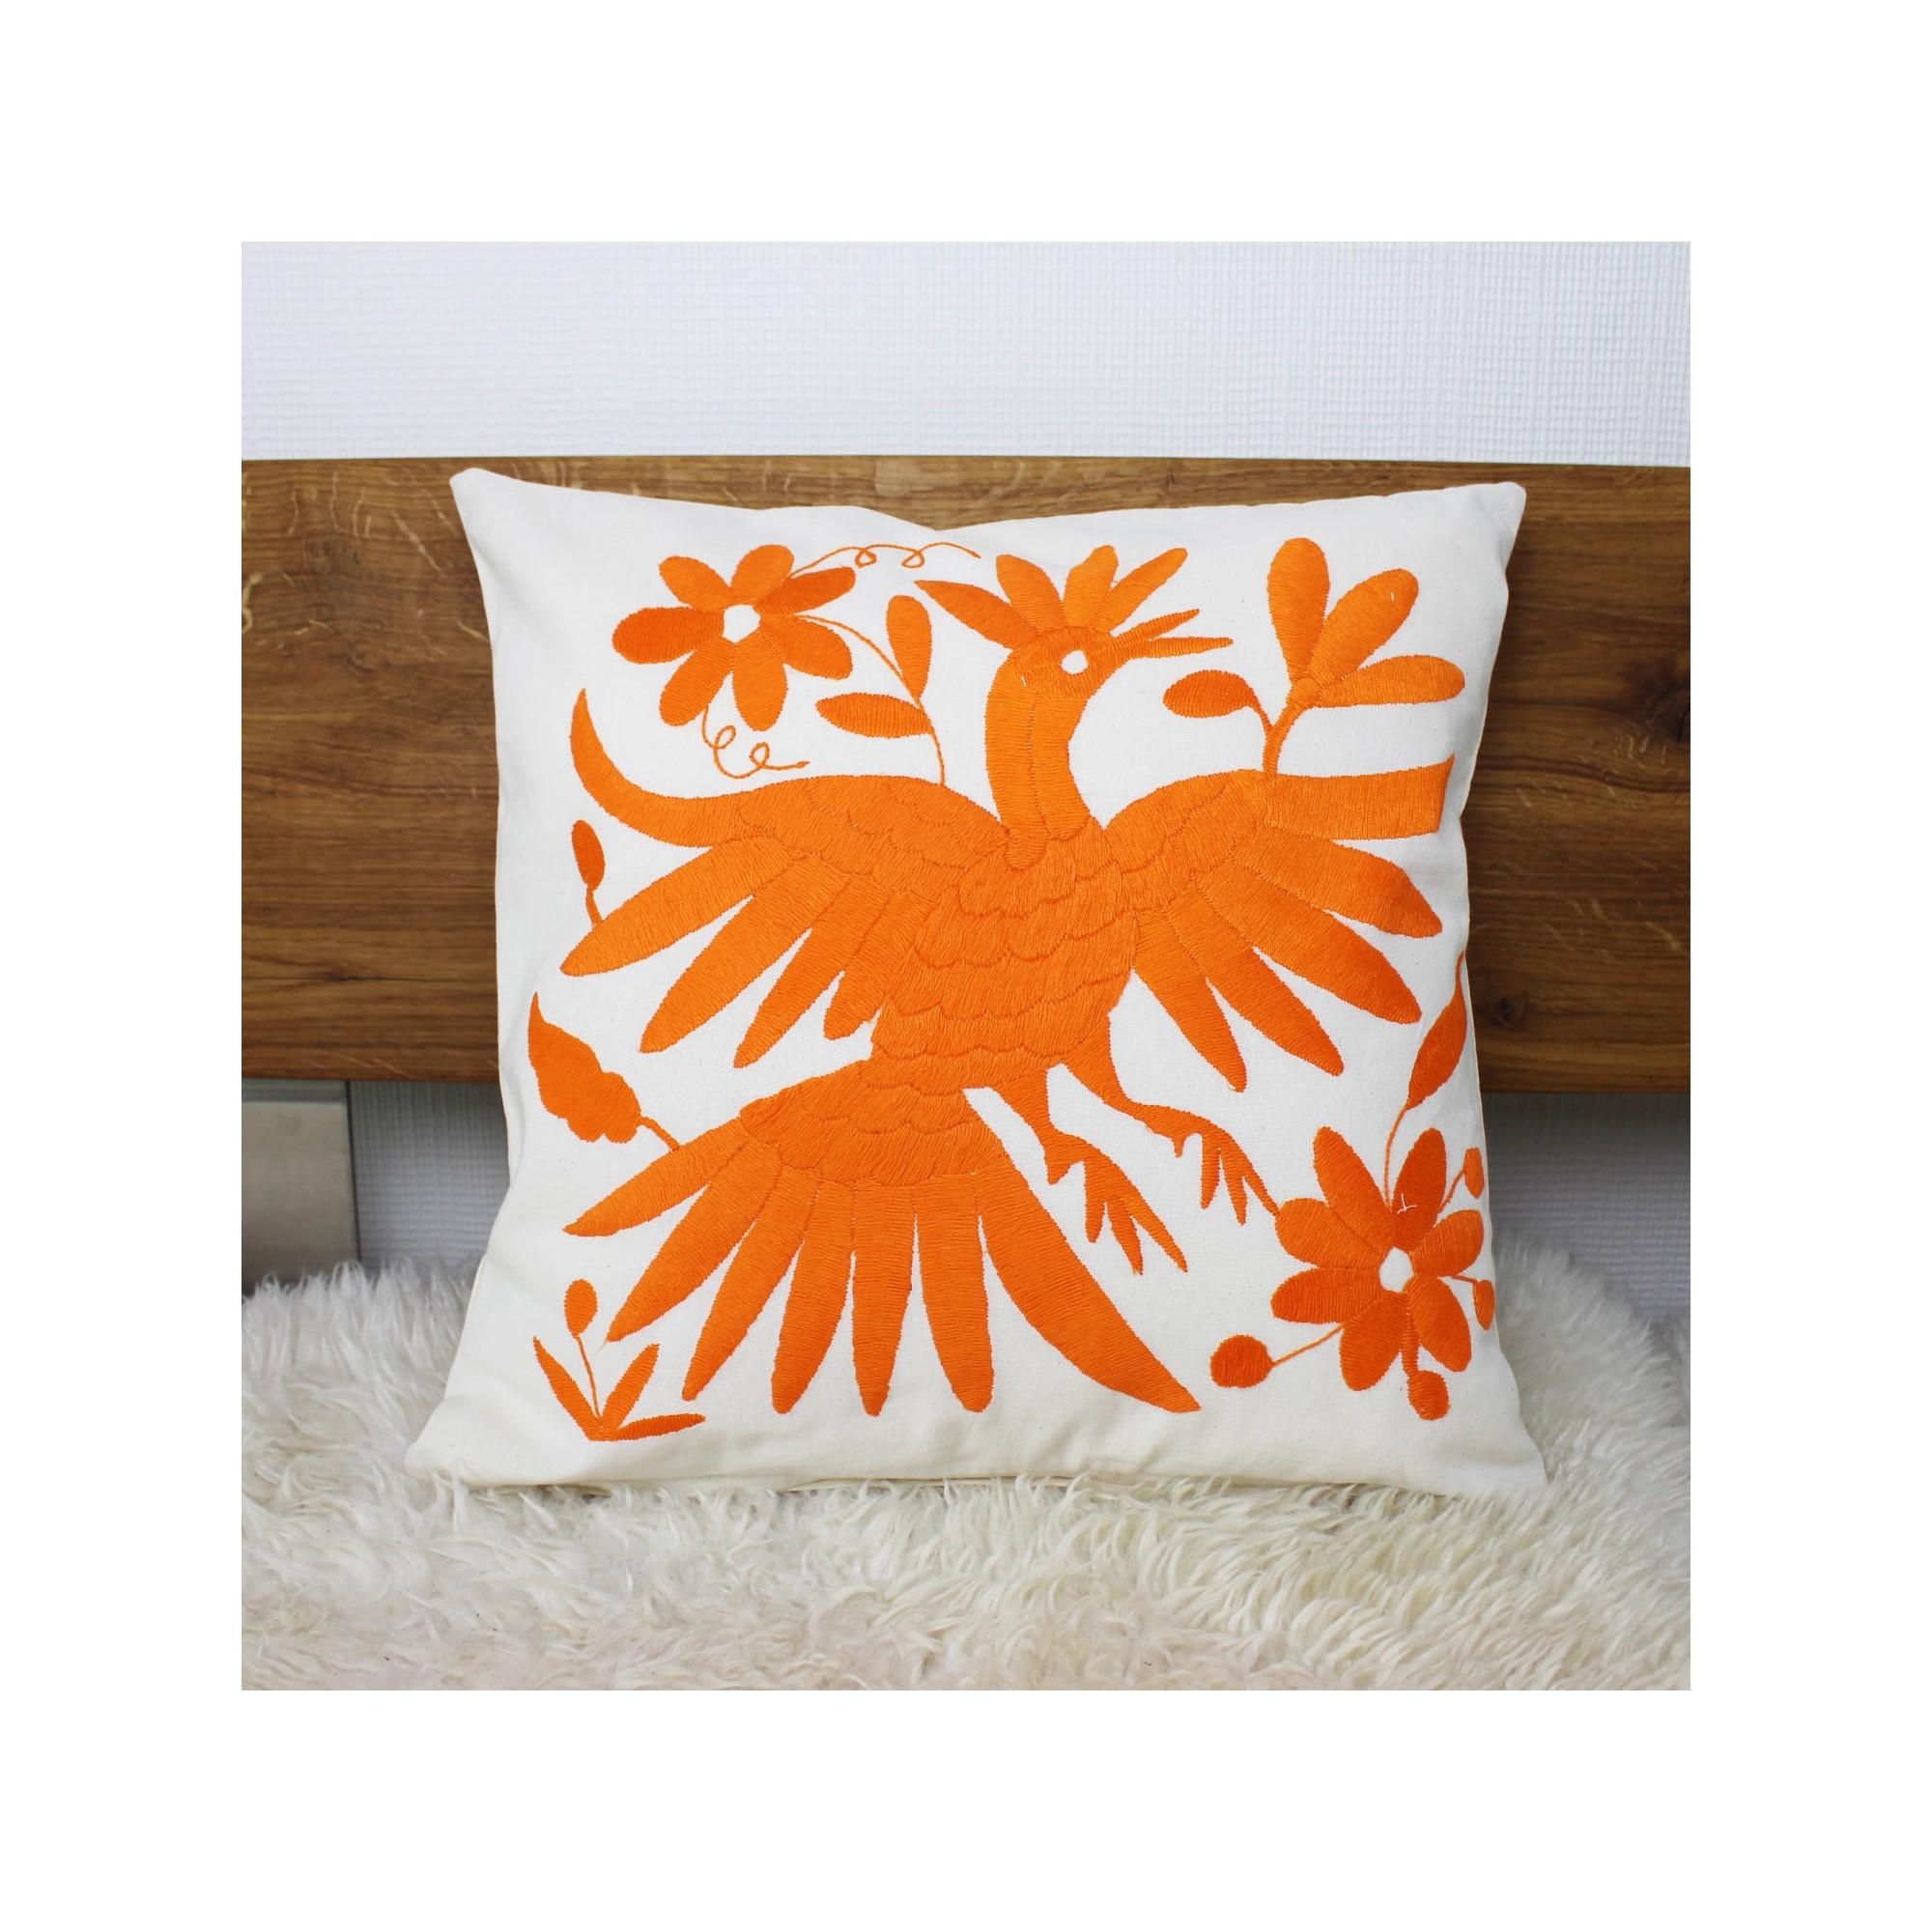 handgewebte sofakissen vogel orange deko kissen kaufen. Black Bedroom Furniture Sets. Home Design Ideas